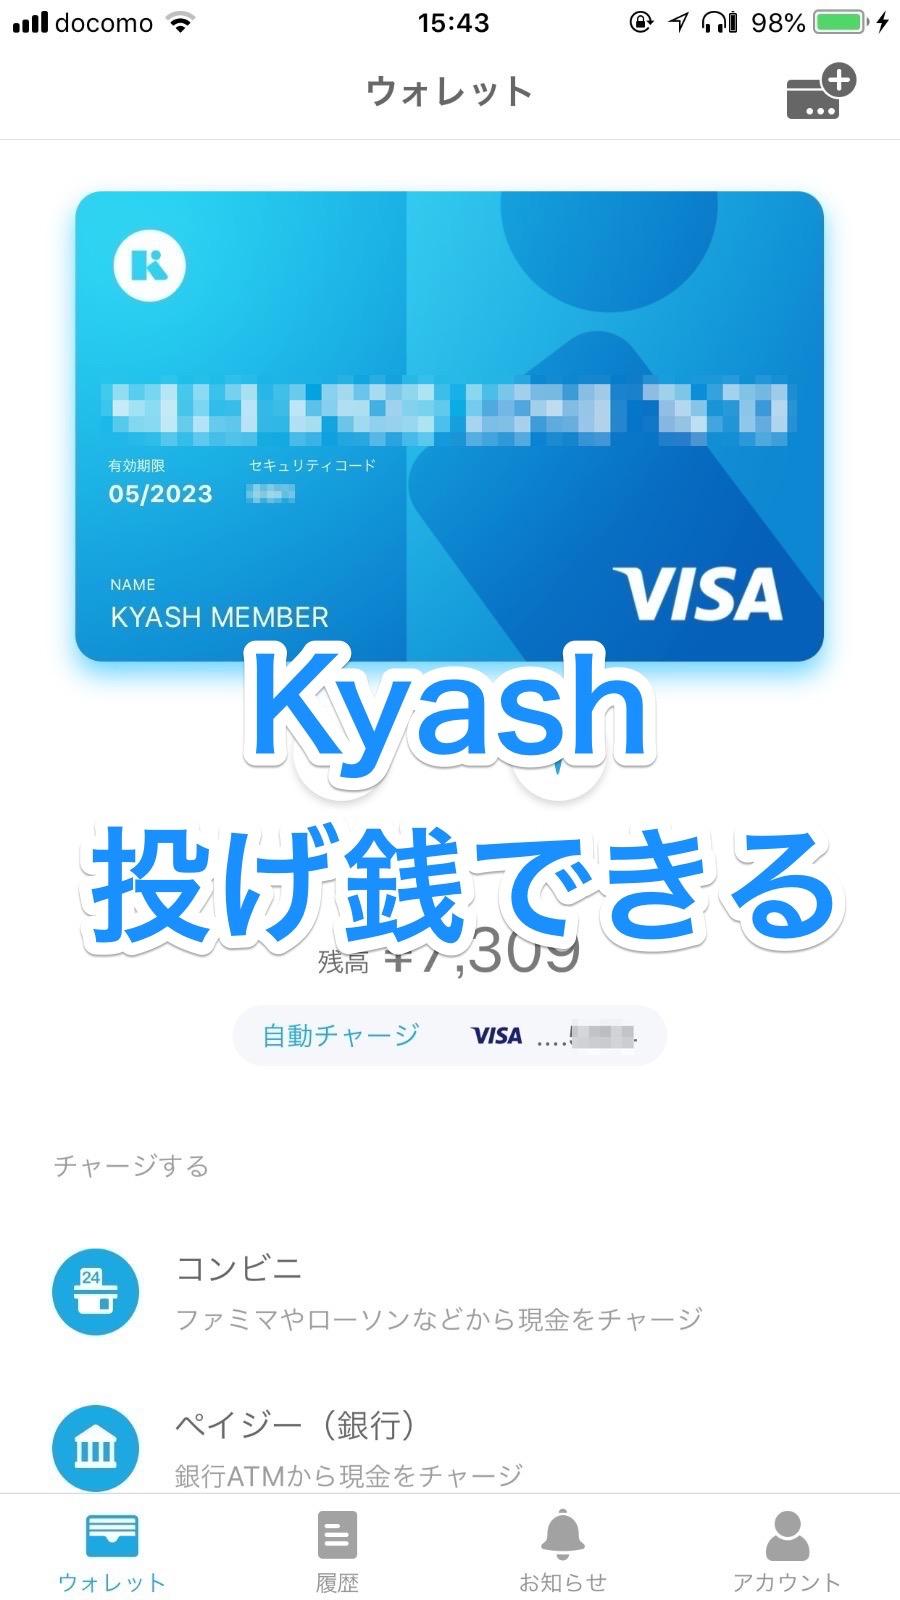 「Kyash」QRコードを公開して投げ銭ができる